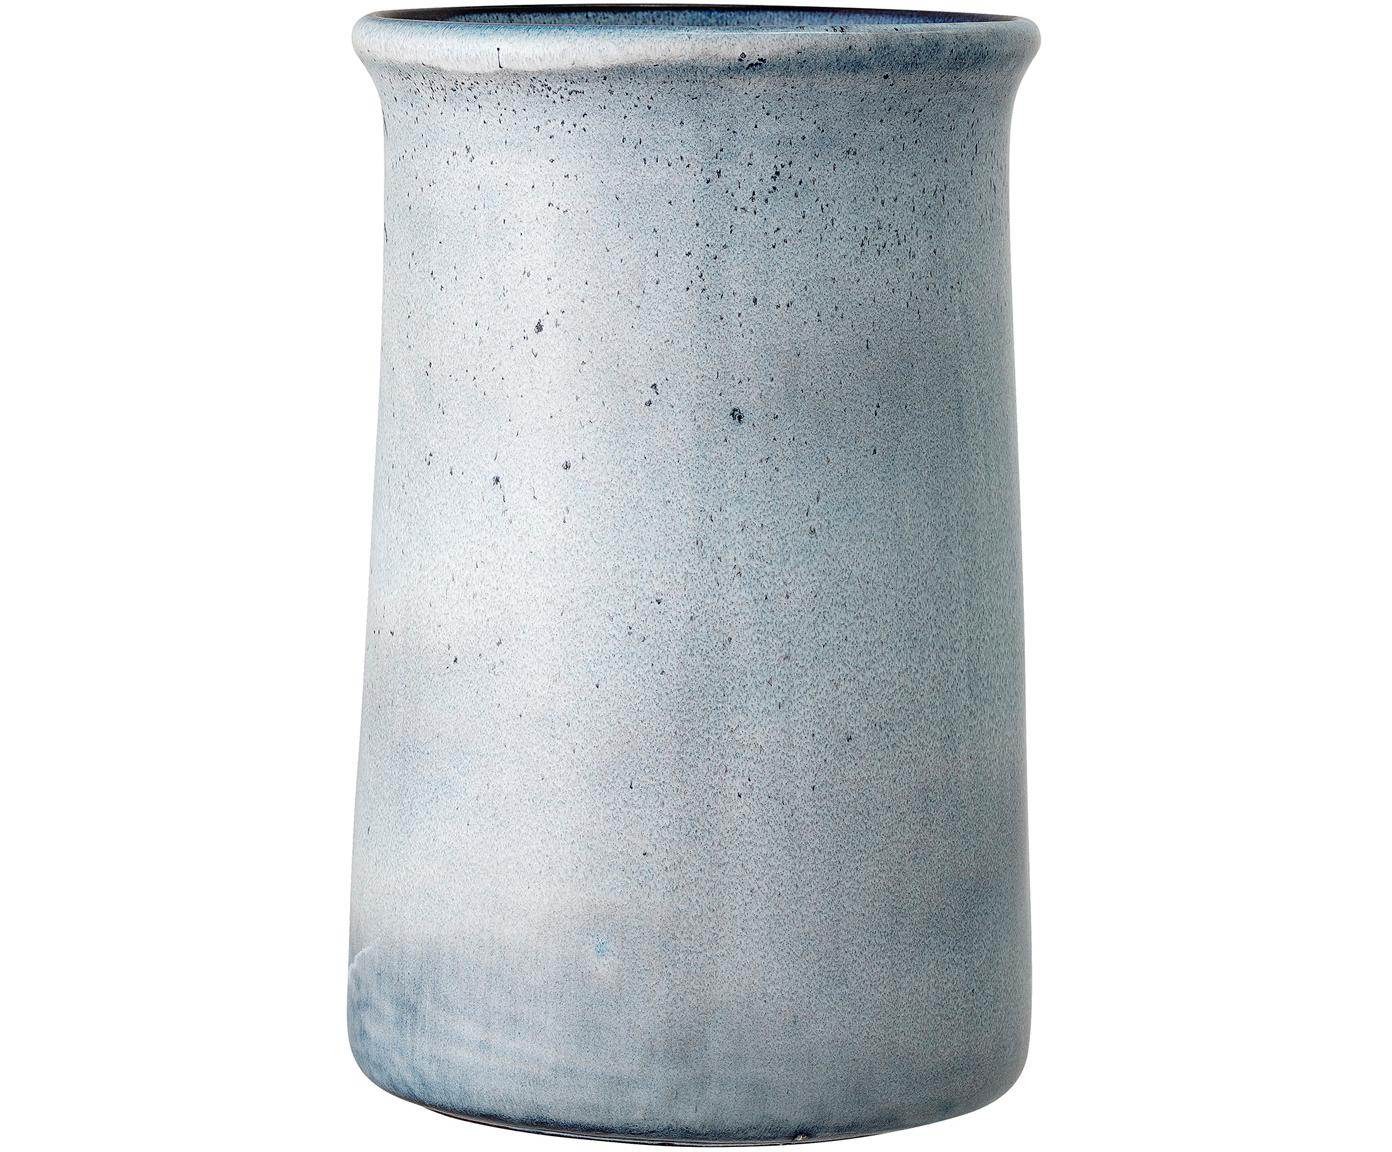 Refrigeratore Sandrine, Terracotta, Blu, Ø 15 x Alt. 23 cm